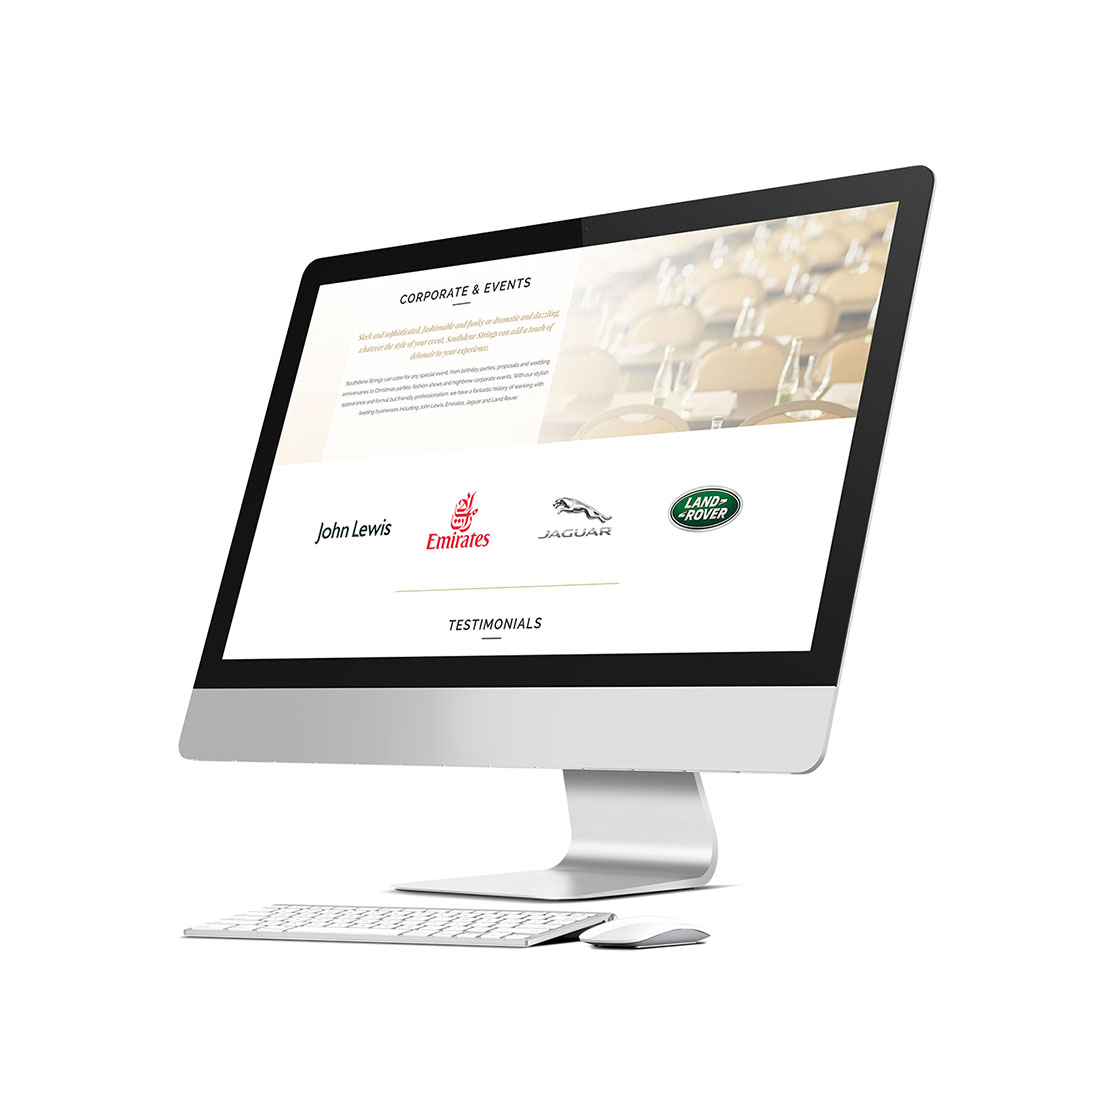 Southdene Strings Site Design Elbowroom Graphics